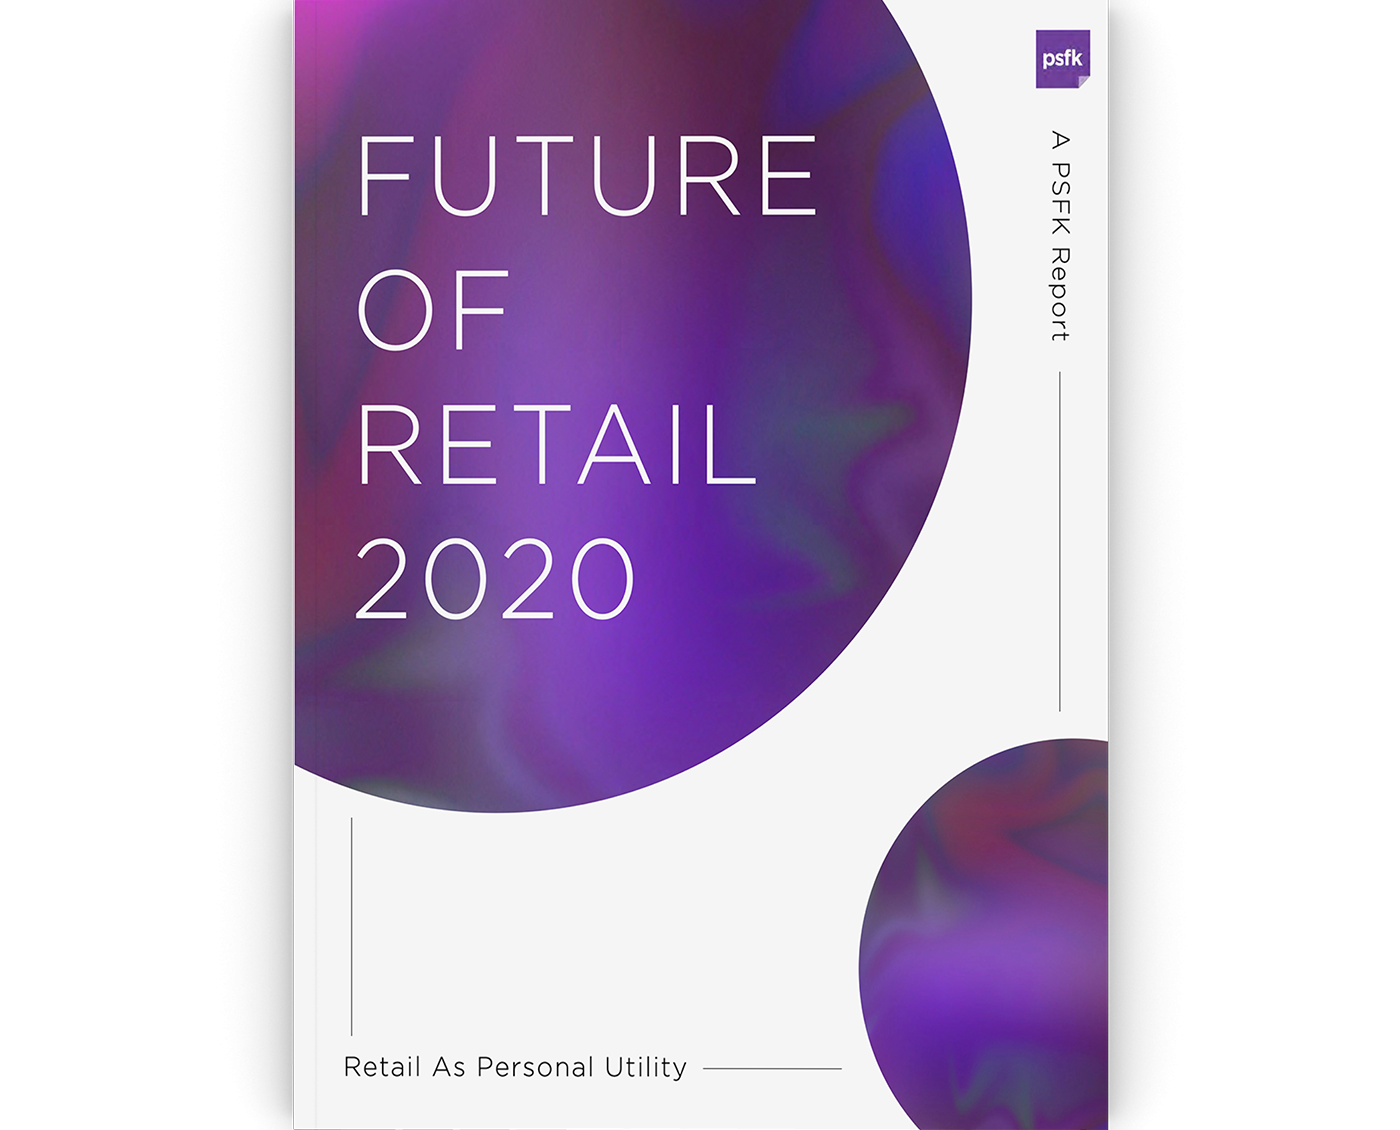 The Future Of Retail 2020: Retail As Personal Utility